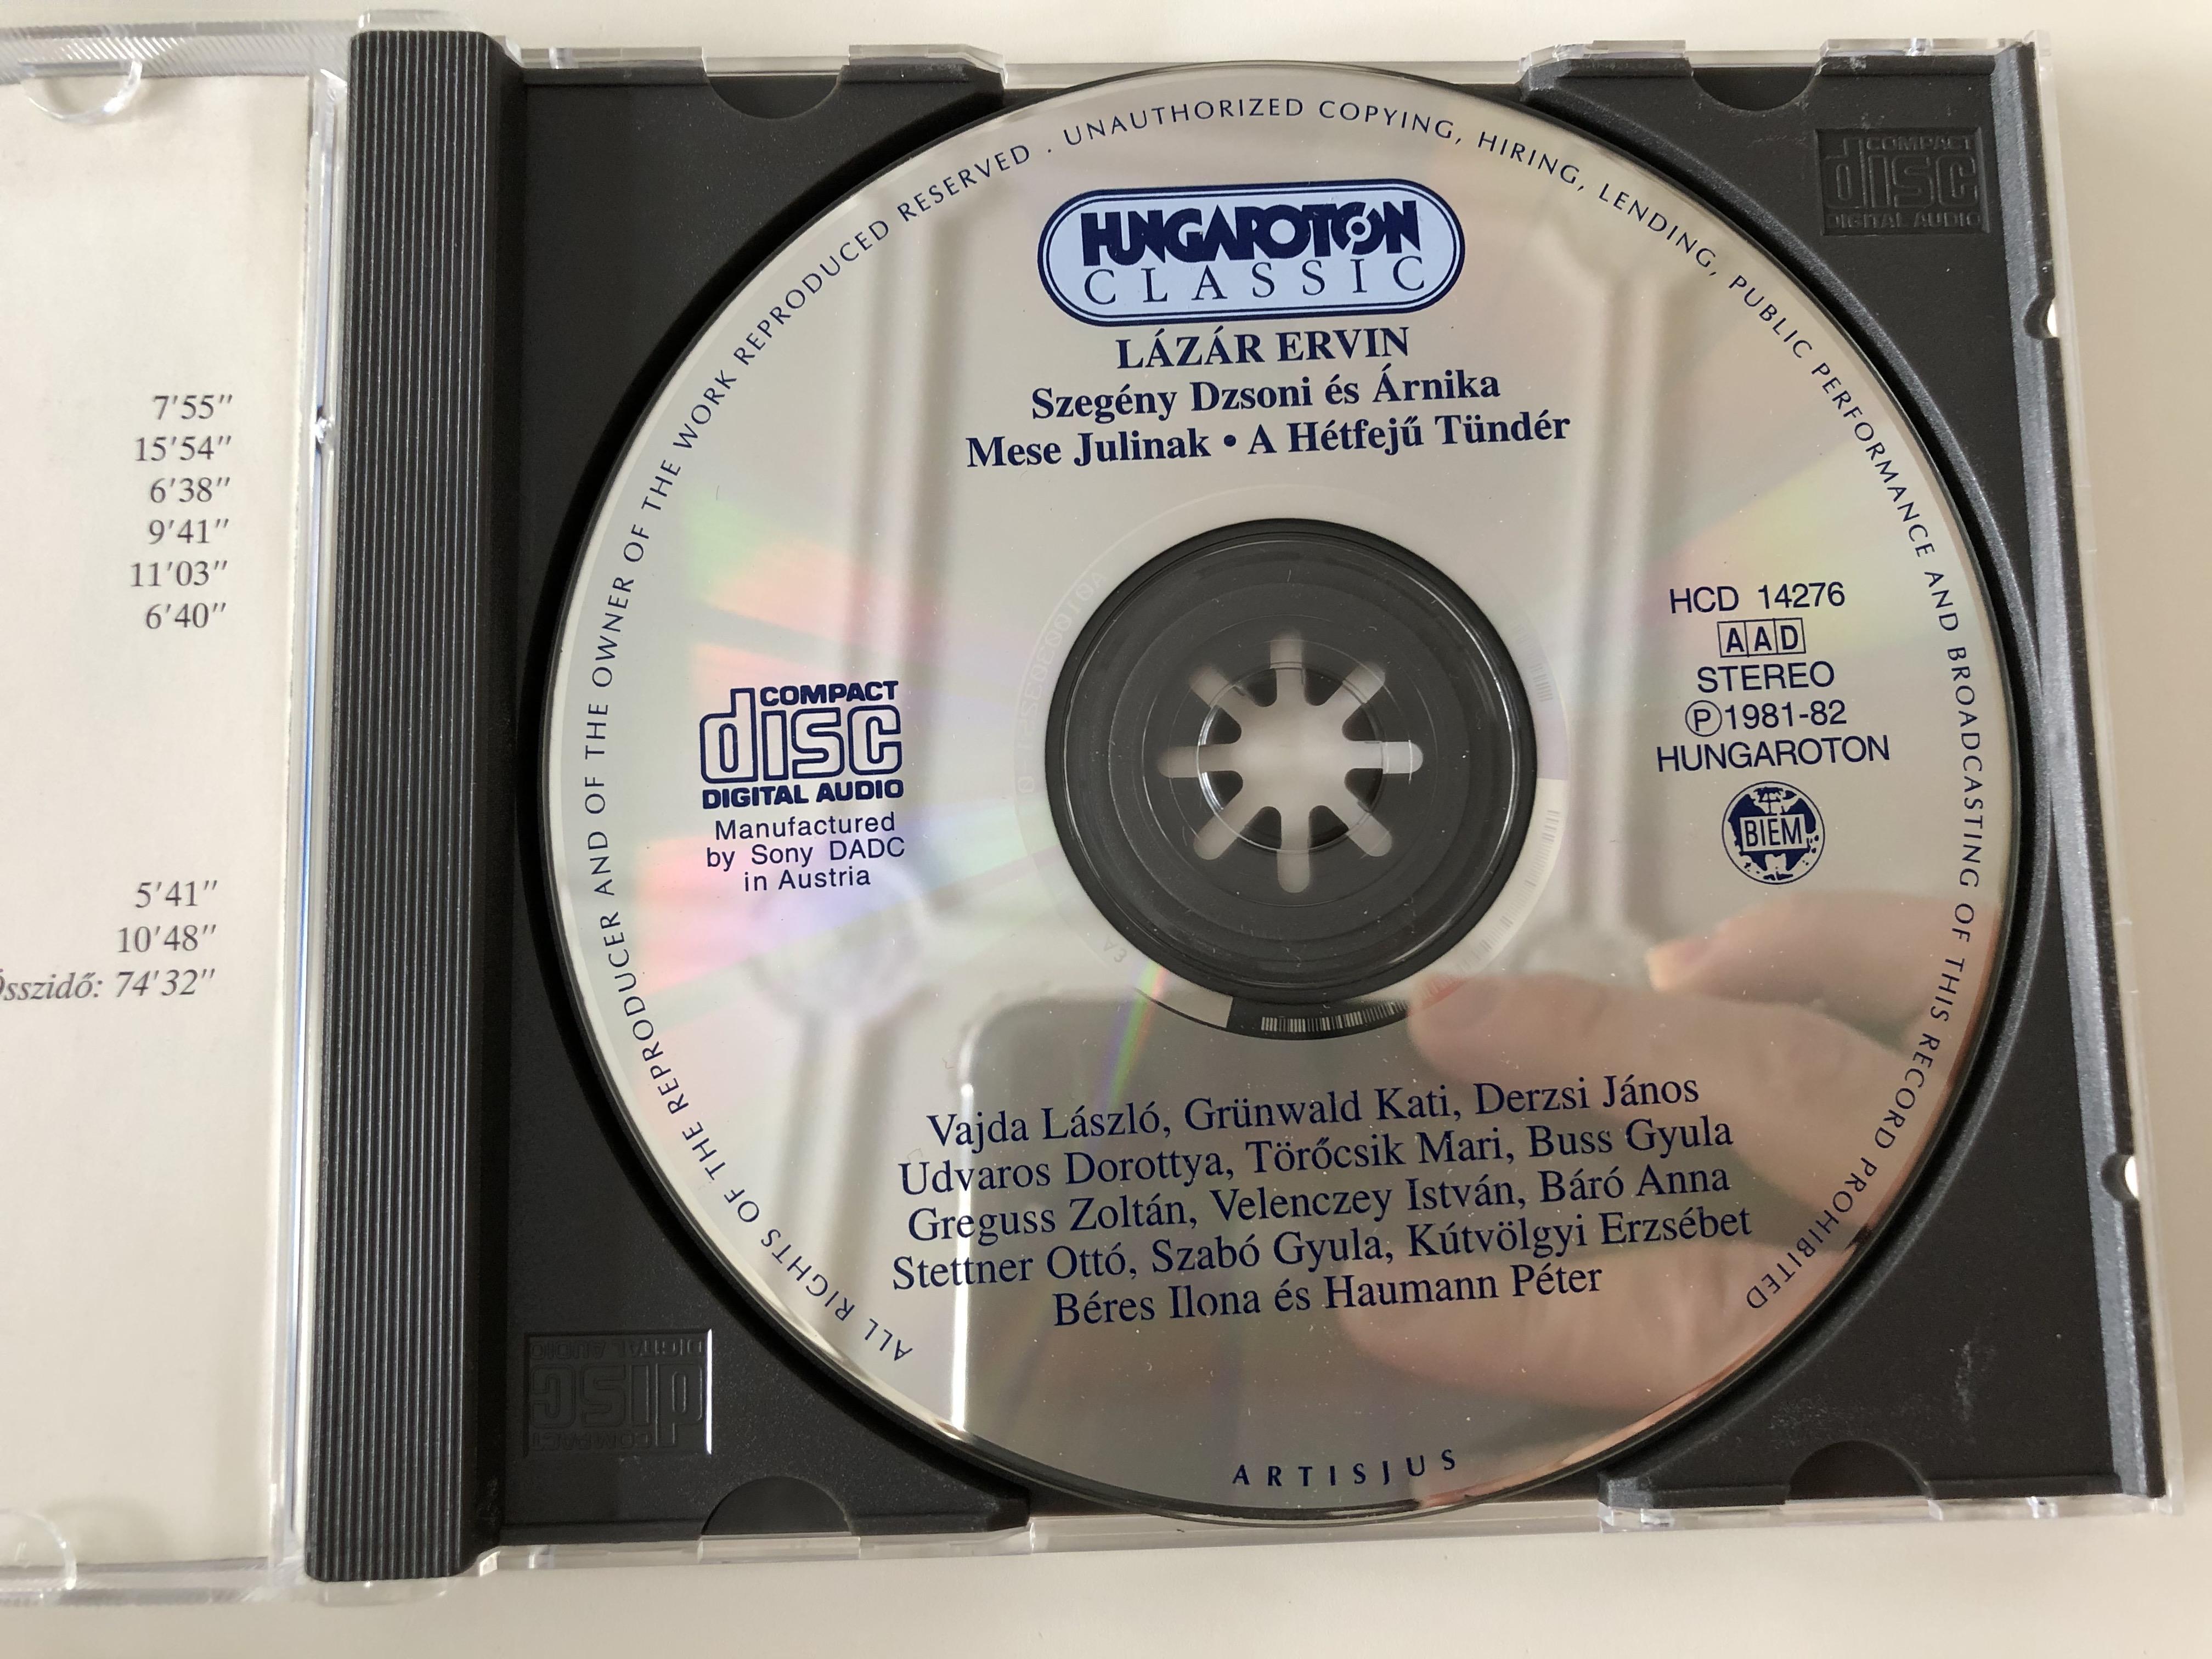 l-z-r-ervin-szeg-ny-dzsoni-s-rnika-mese-julinak-a-h-tfej-t-nd-r-hungaroton-classic-audio-cd-1999-stereo-hcd-14276-3-.jpg